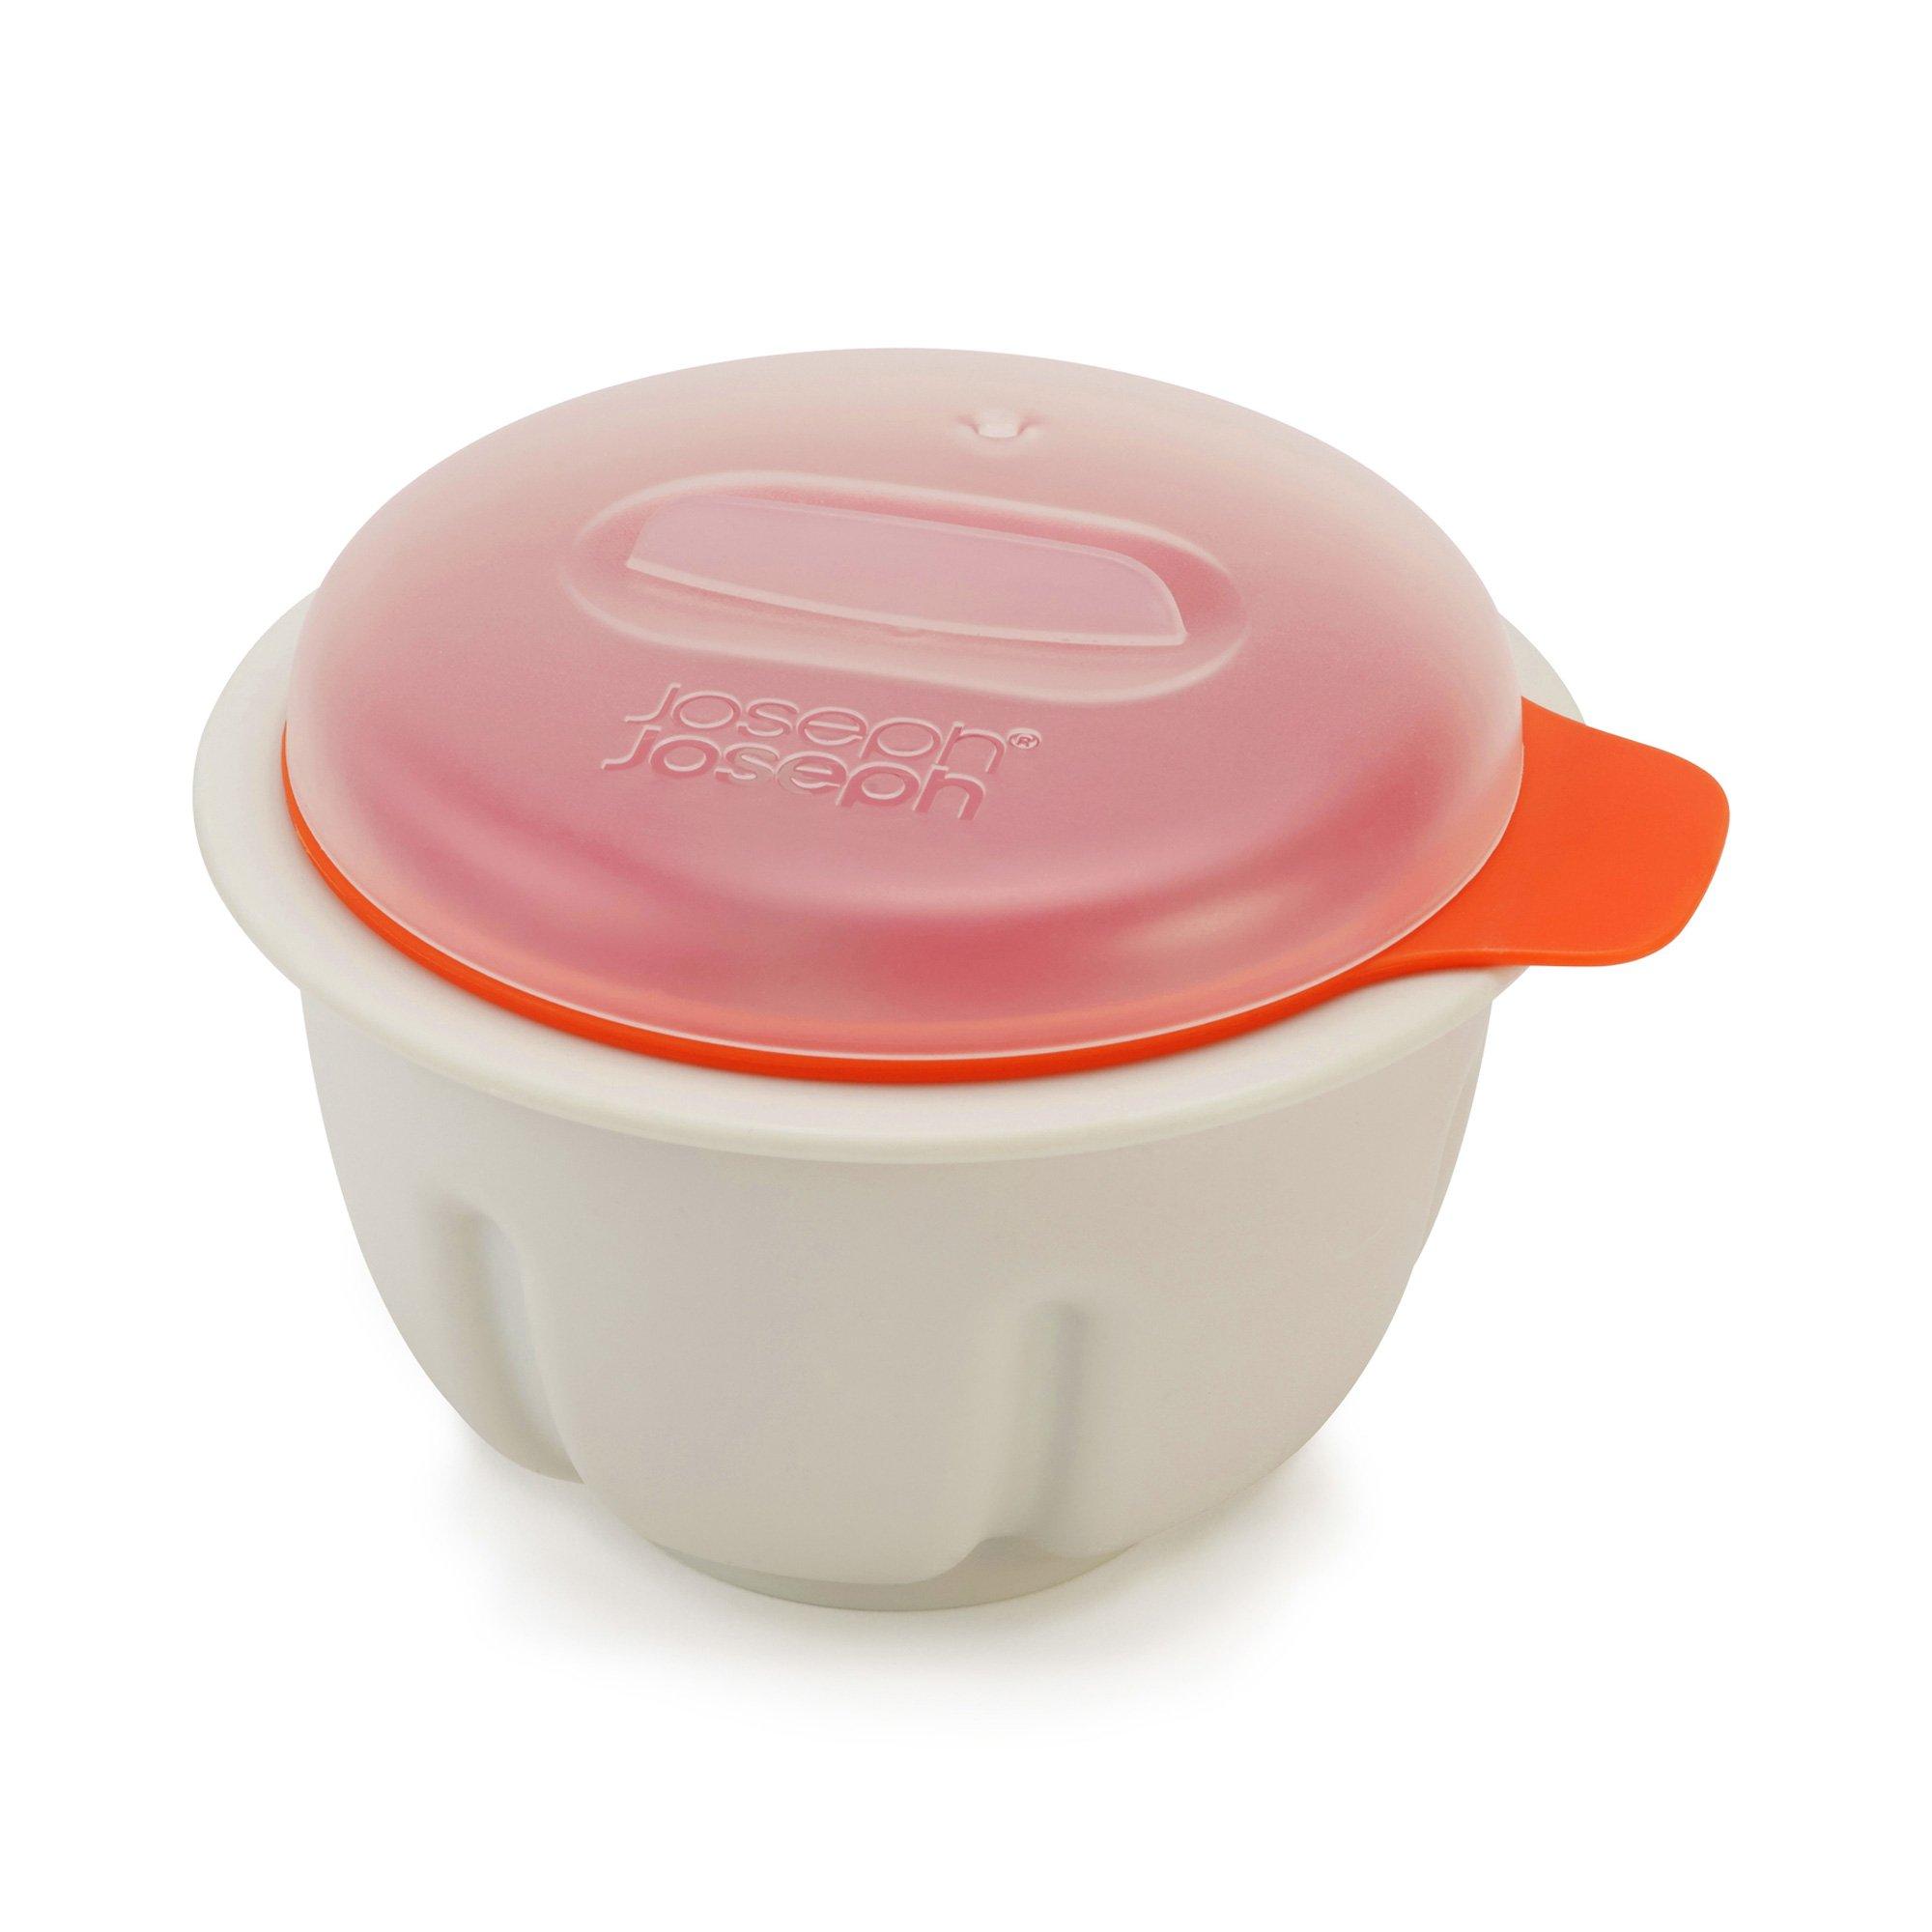 Joseph Joseph 45019 M-Cuisine Microwave Egg Poacher, Orange